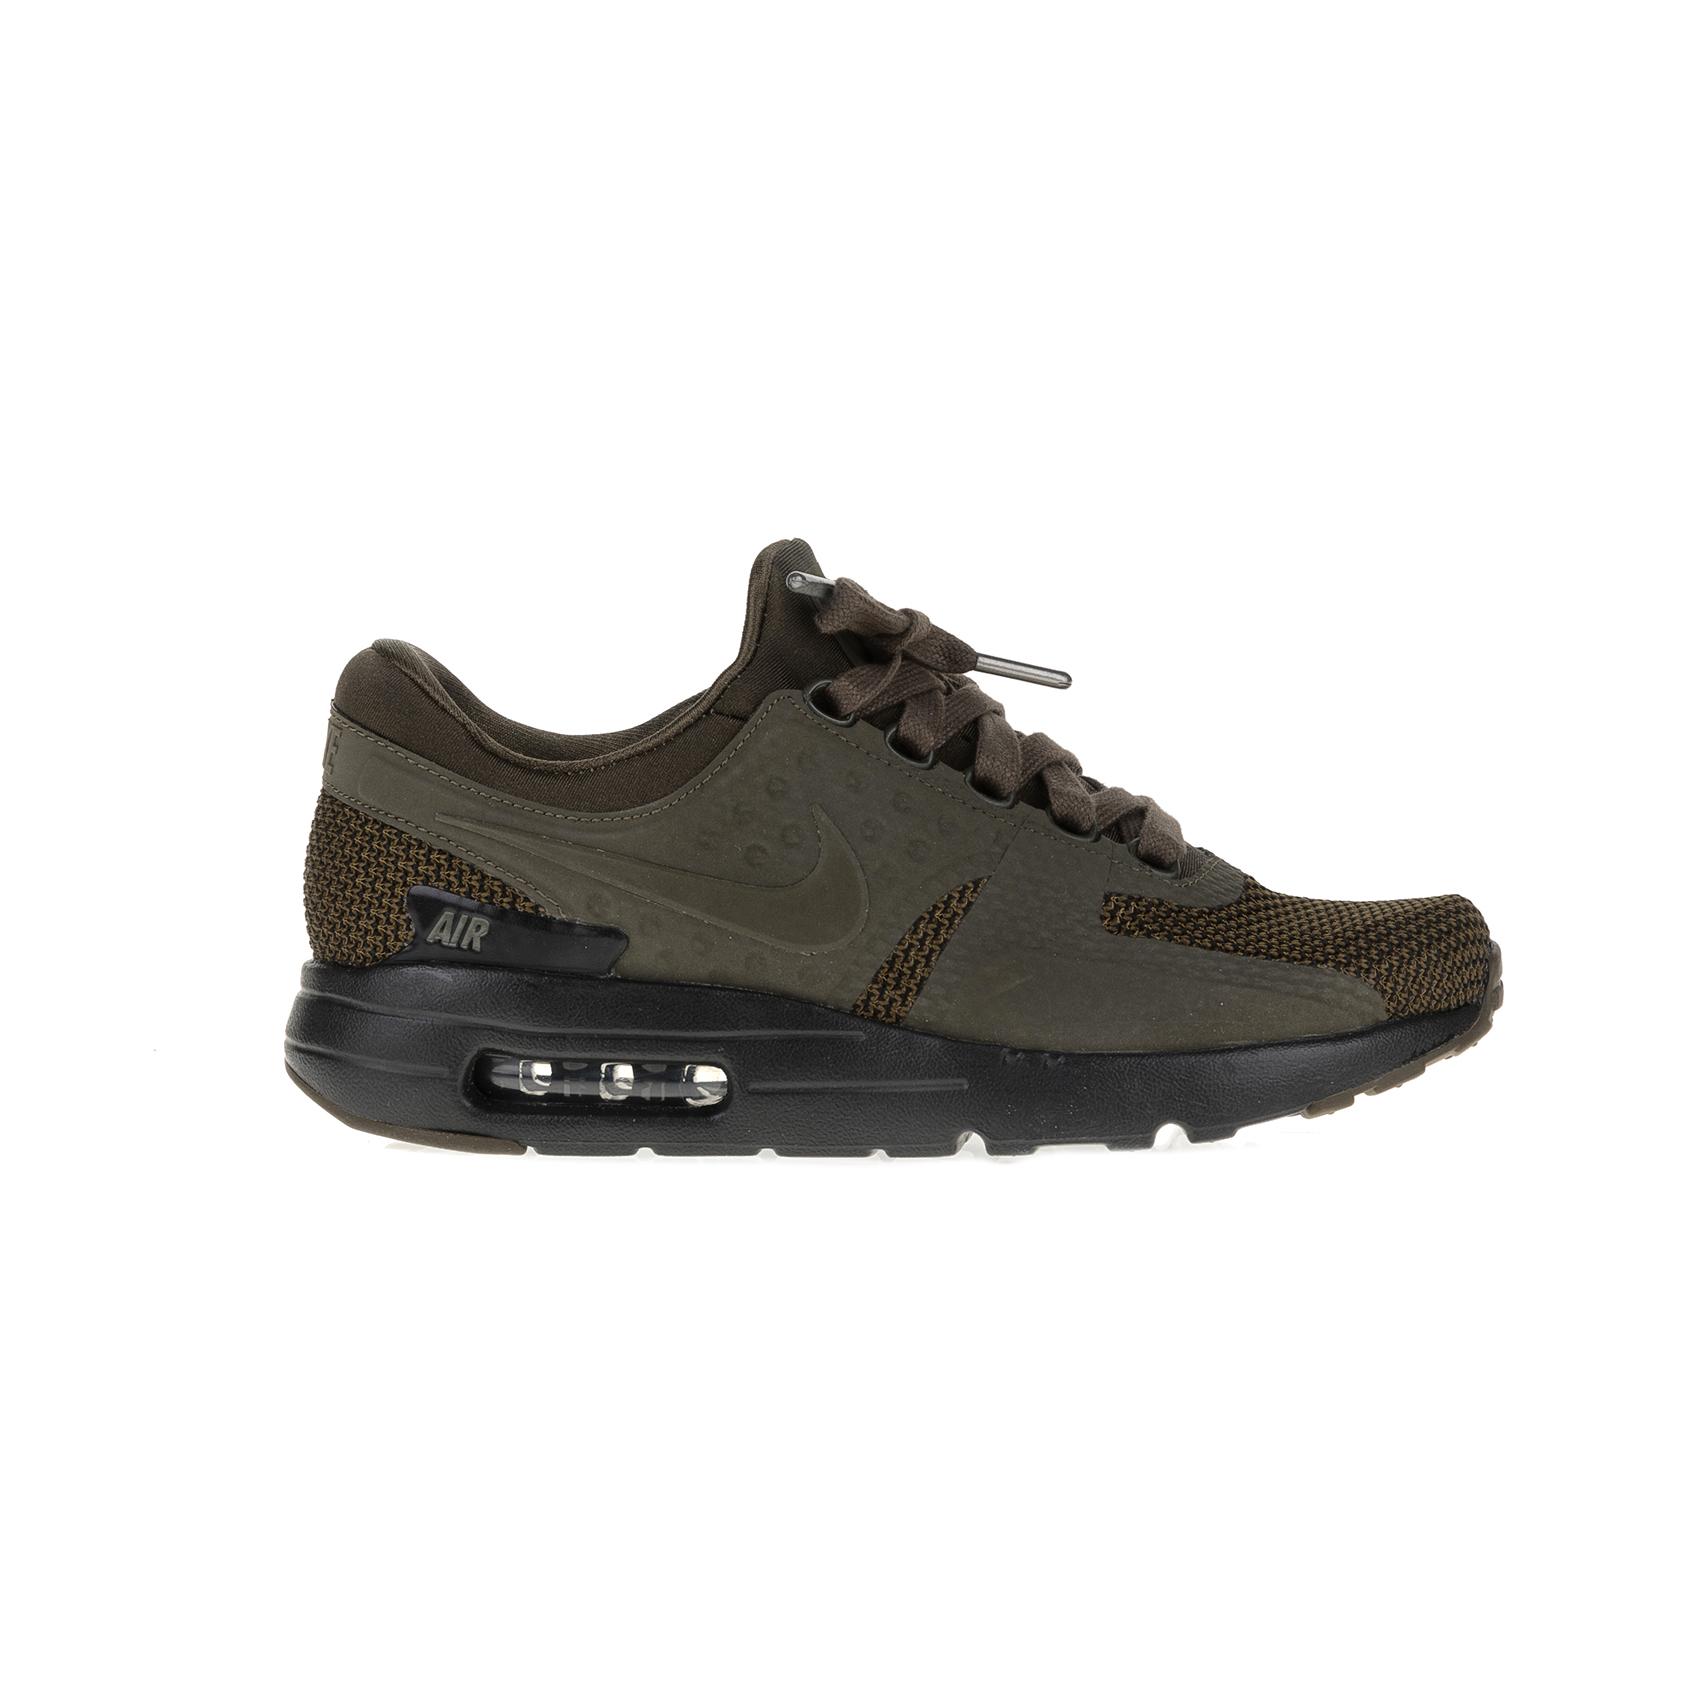 NIKE – Ανδικά παπούτσια NIKE AIR MAX ZERO PREMIUM χακί